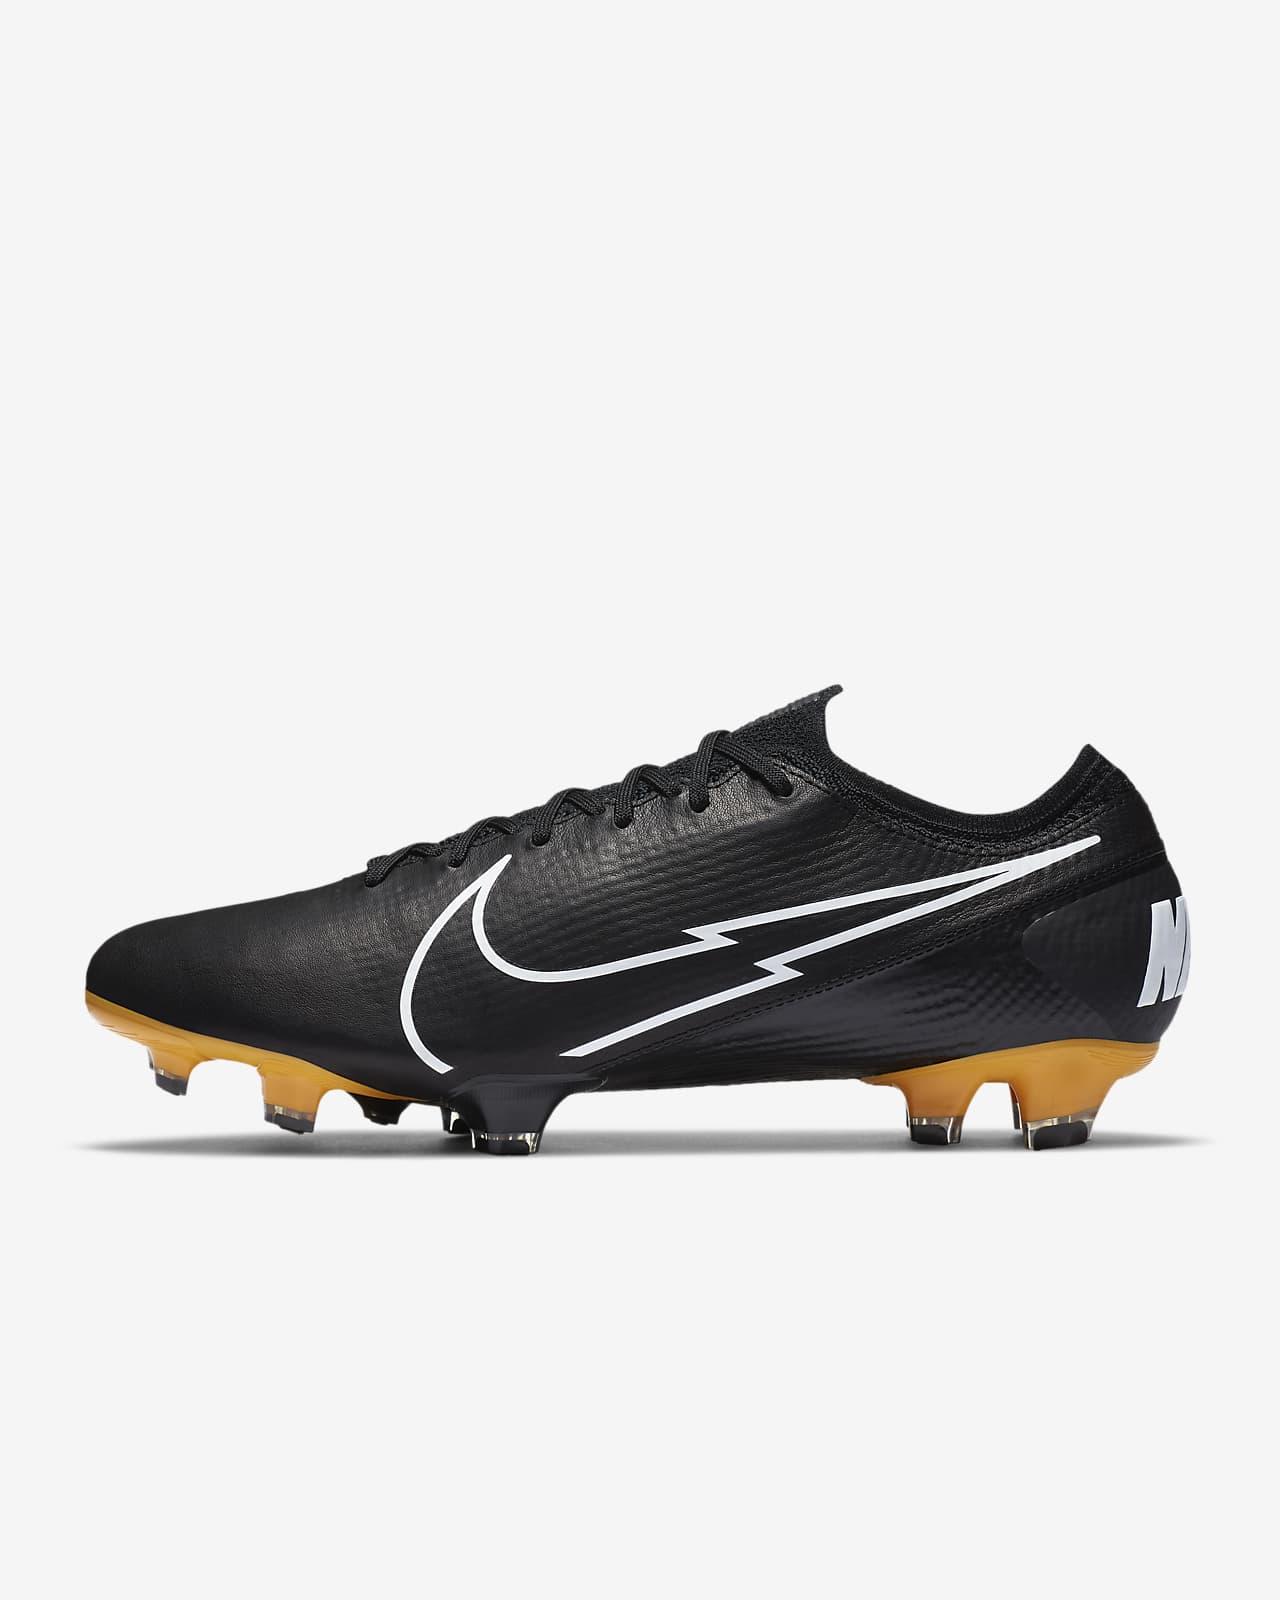 Nike Mercurial Vapor 13 Elite Tech Craft FG Voetbalschoen (stevige ondergrond)